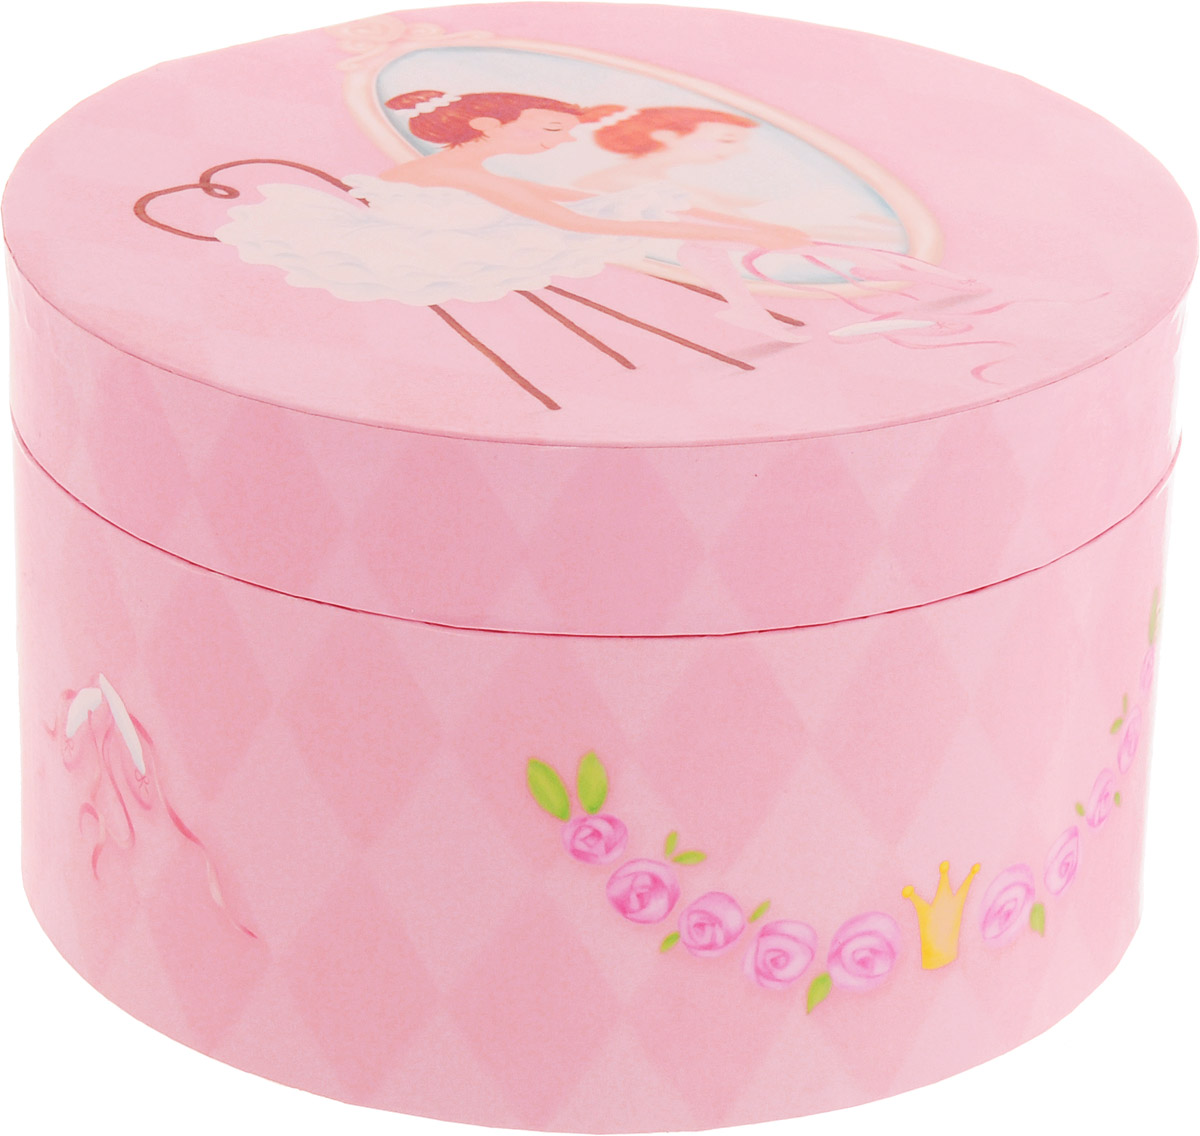 Jakos Музыкальная шкатулка Балерина перед зеркалом музыкальная шкатулка jakos балерина цвет бежевый розовый